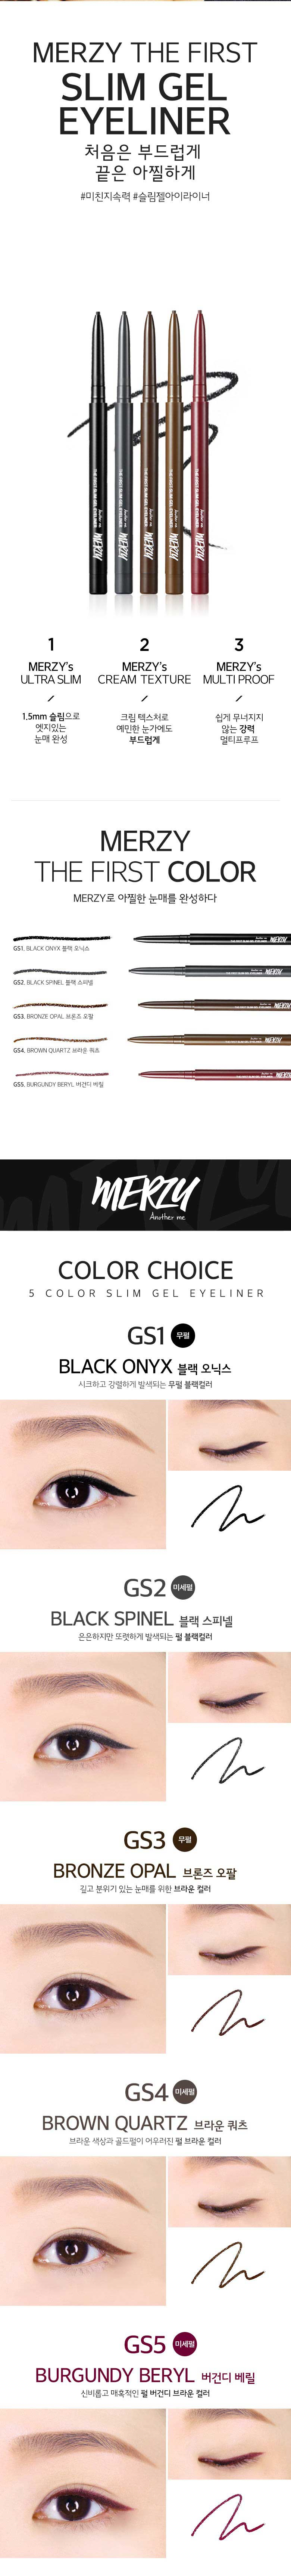 -merzy-the-first-slim-gel-eyeliner2.jpg